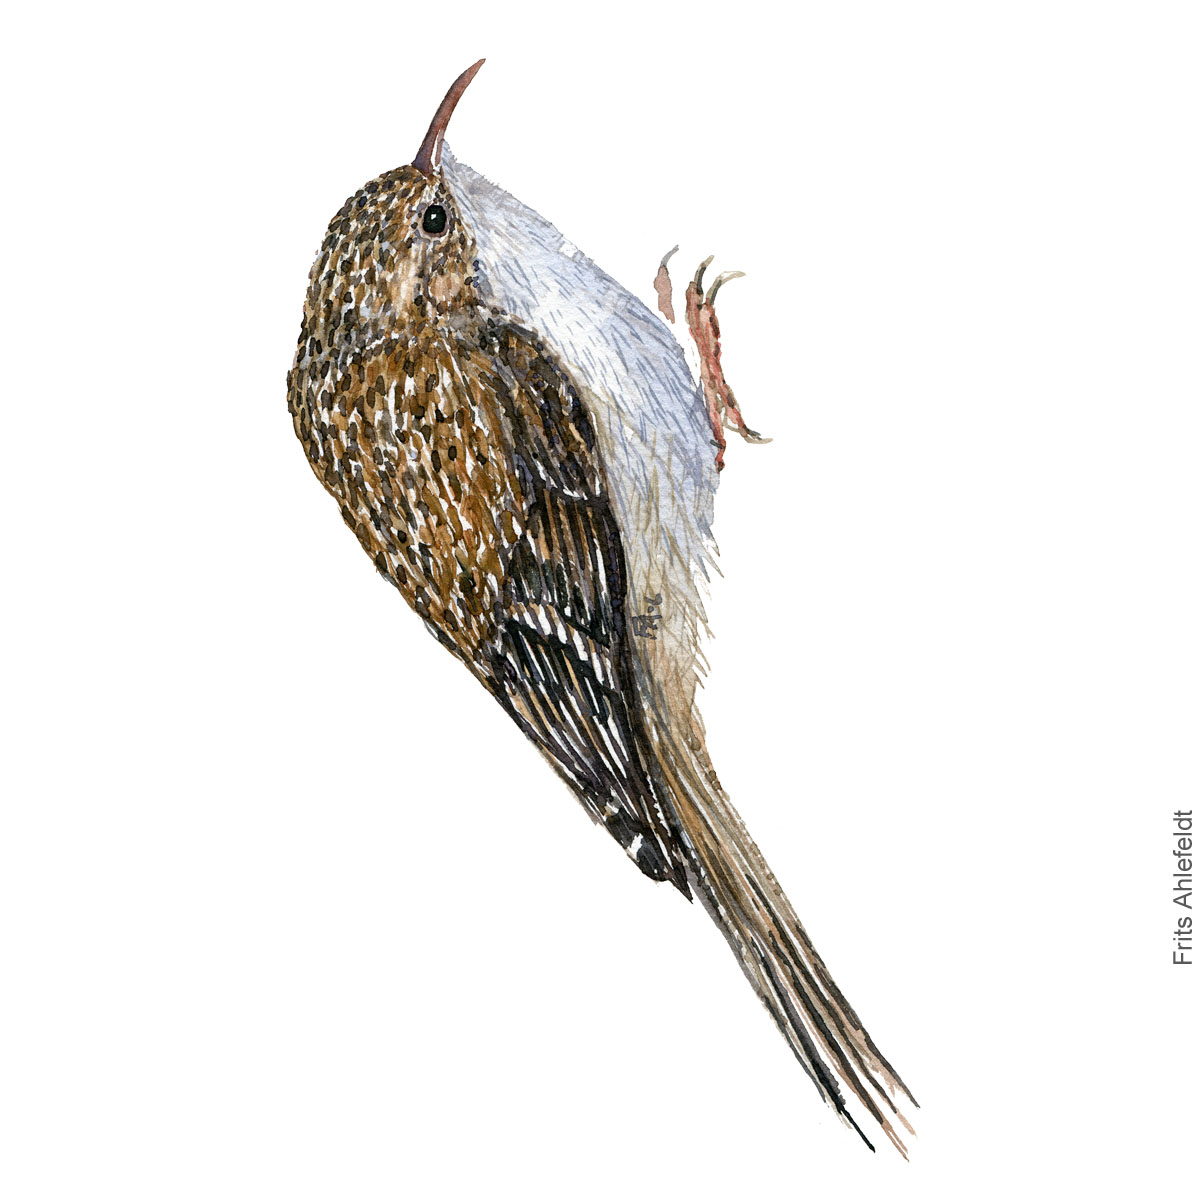 Korttaaet traeloeber - Short toed treecreeper - Bird watercolor painting. Artwork by Frits Ahlefeldt. Fugle akvarel